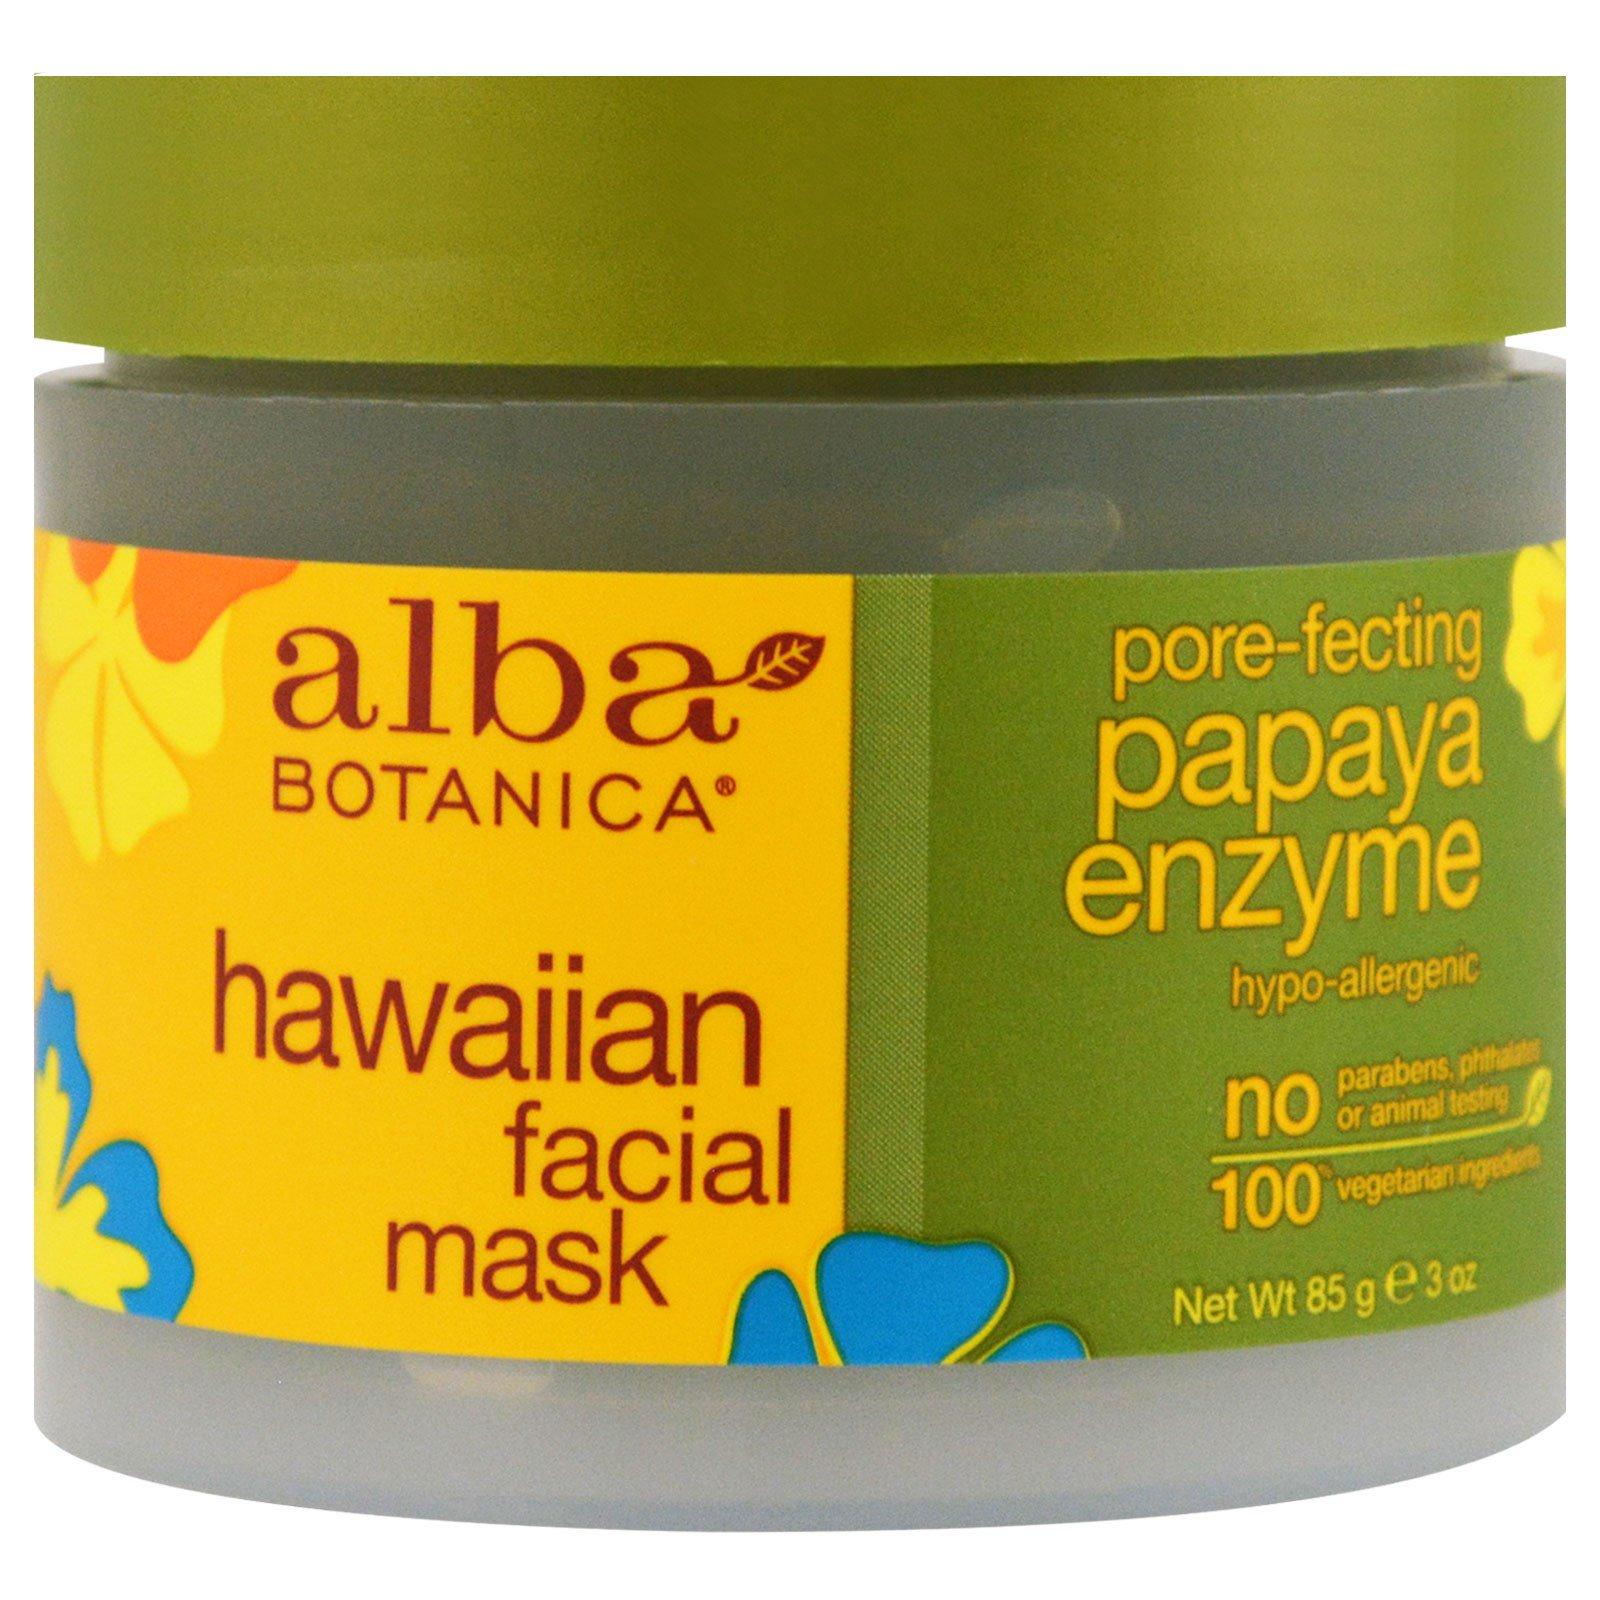 Alba Botanica, Hawaiian Facial Mask, Pore-Fecting Papaya